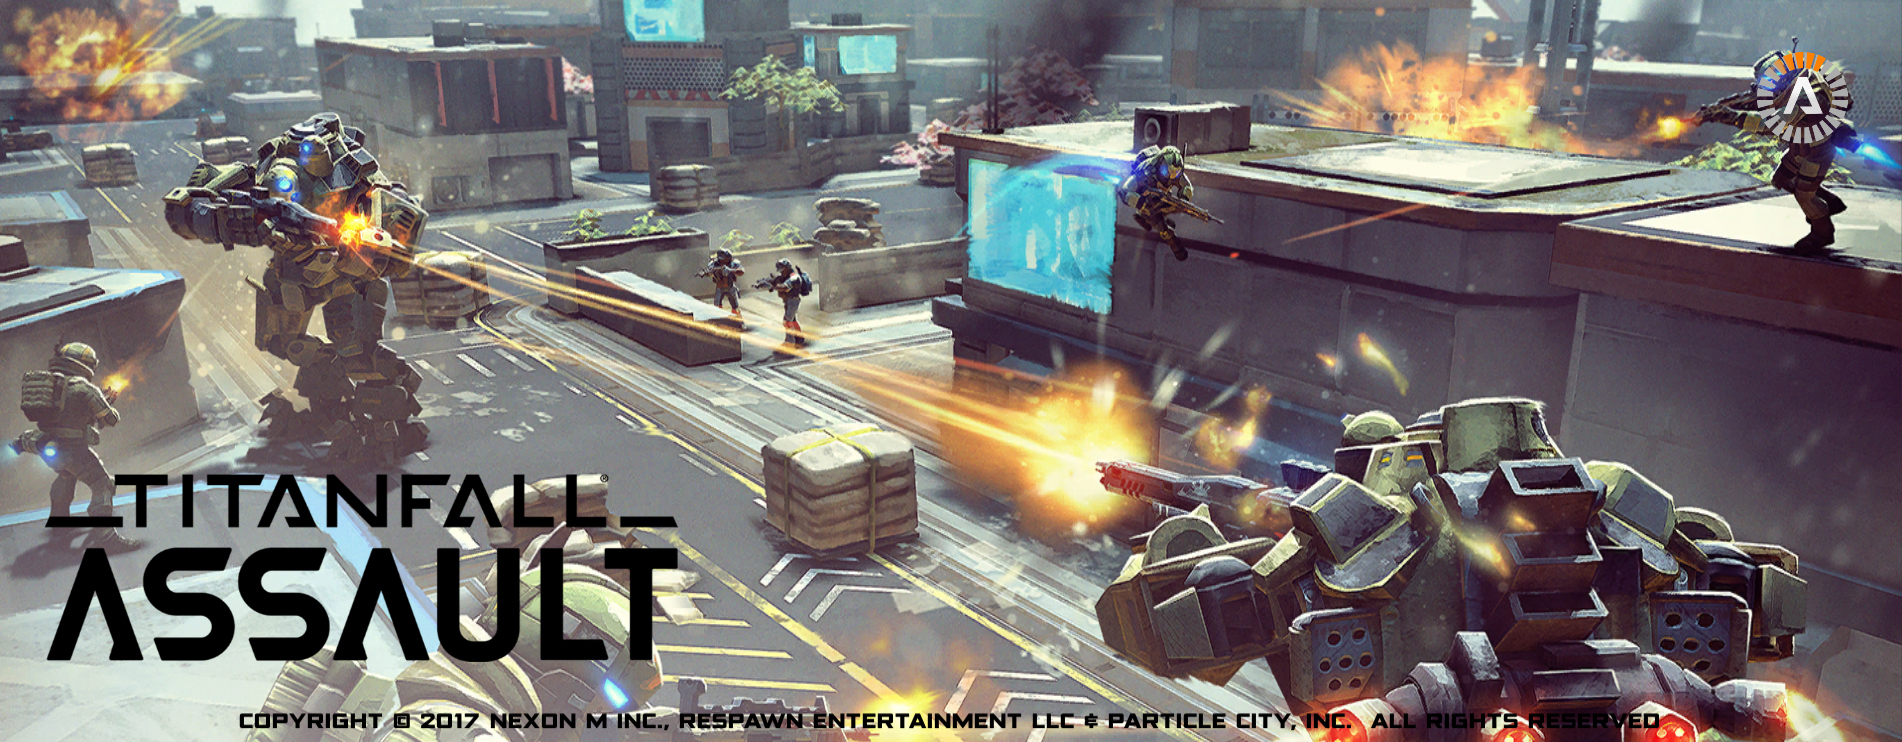 Titanfall: Assault mobile